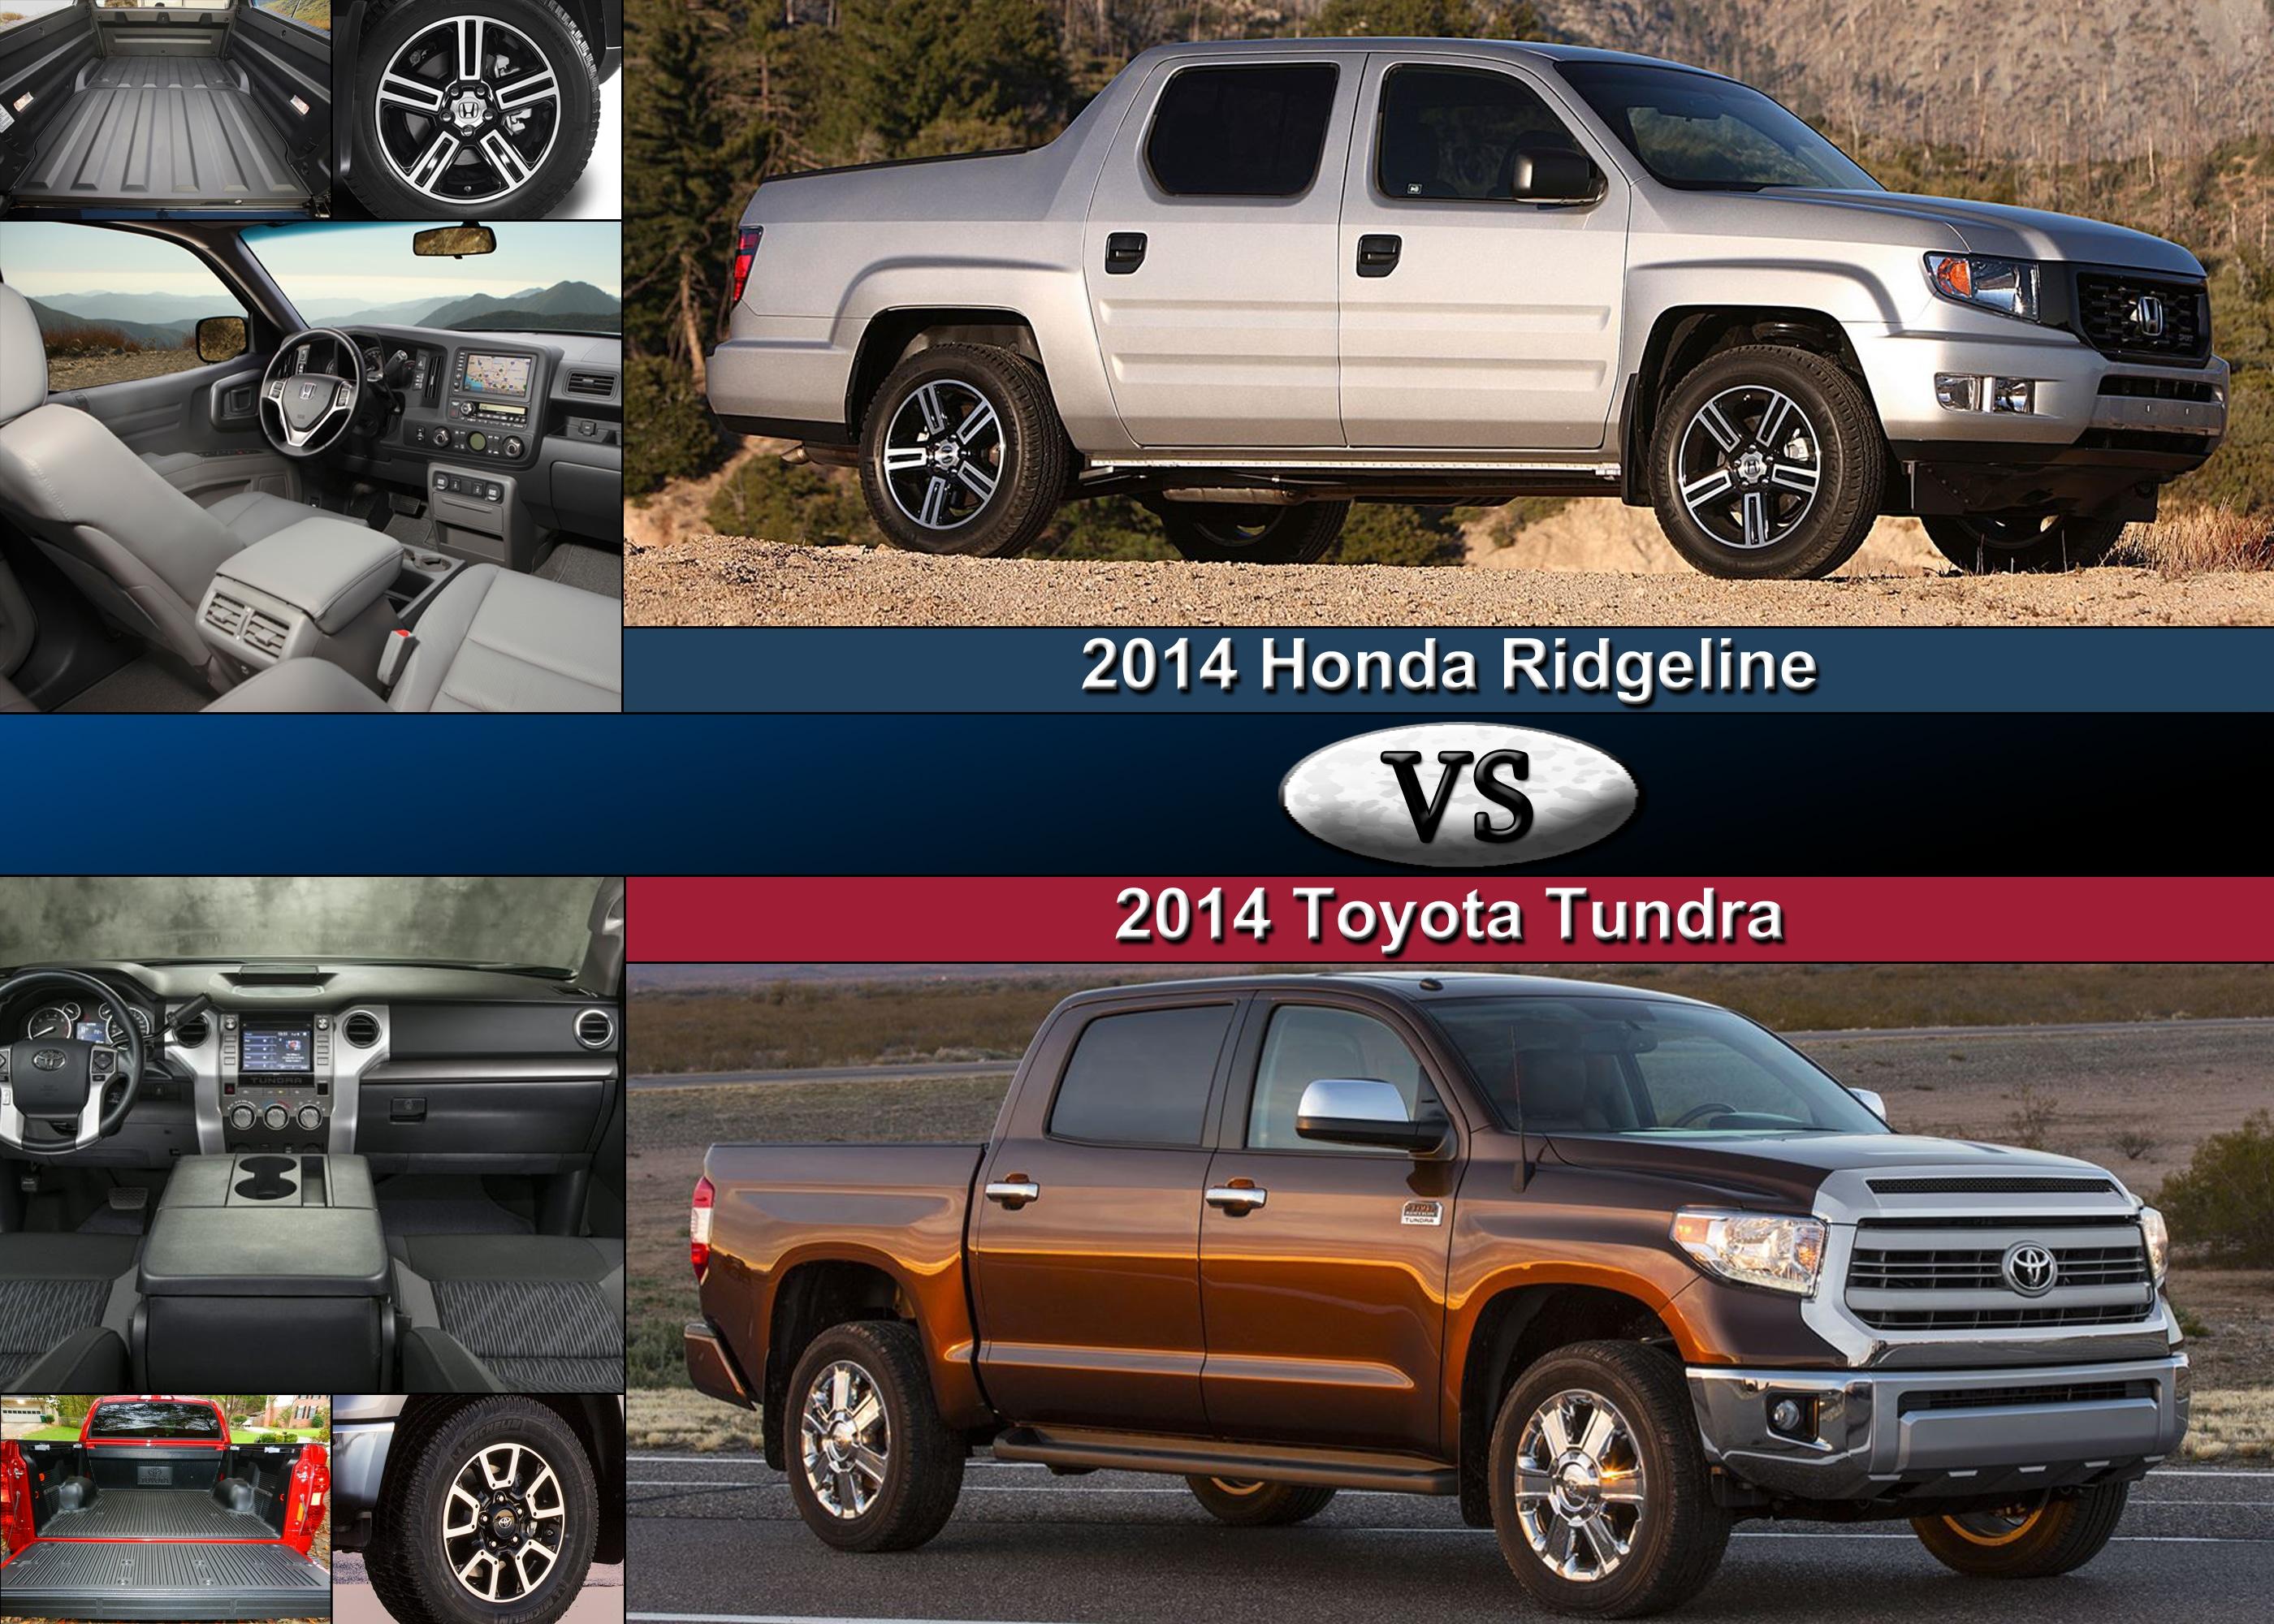 2014 honda ridgeline vs 2014 toyota tundra comparing key features. Black Bedroom Furniture Sets. Home Design Ideas